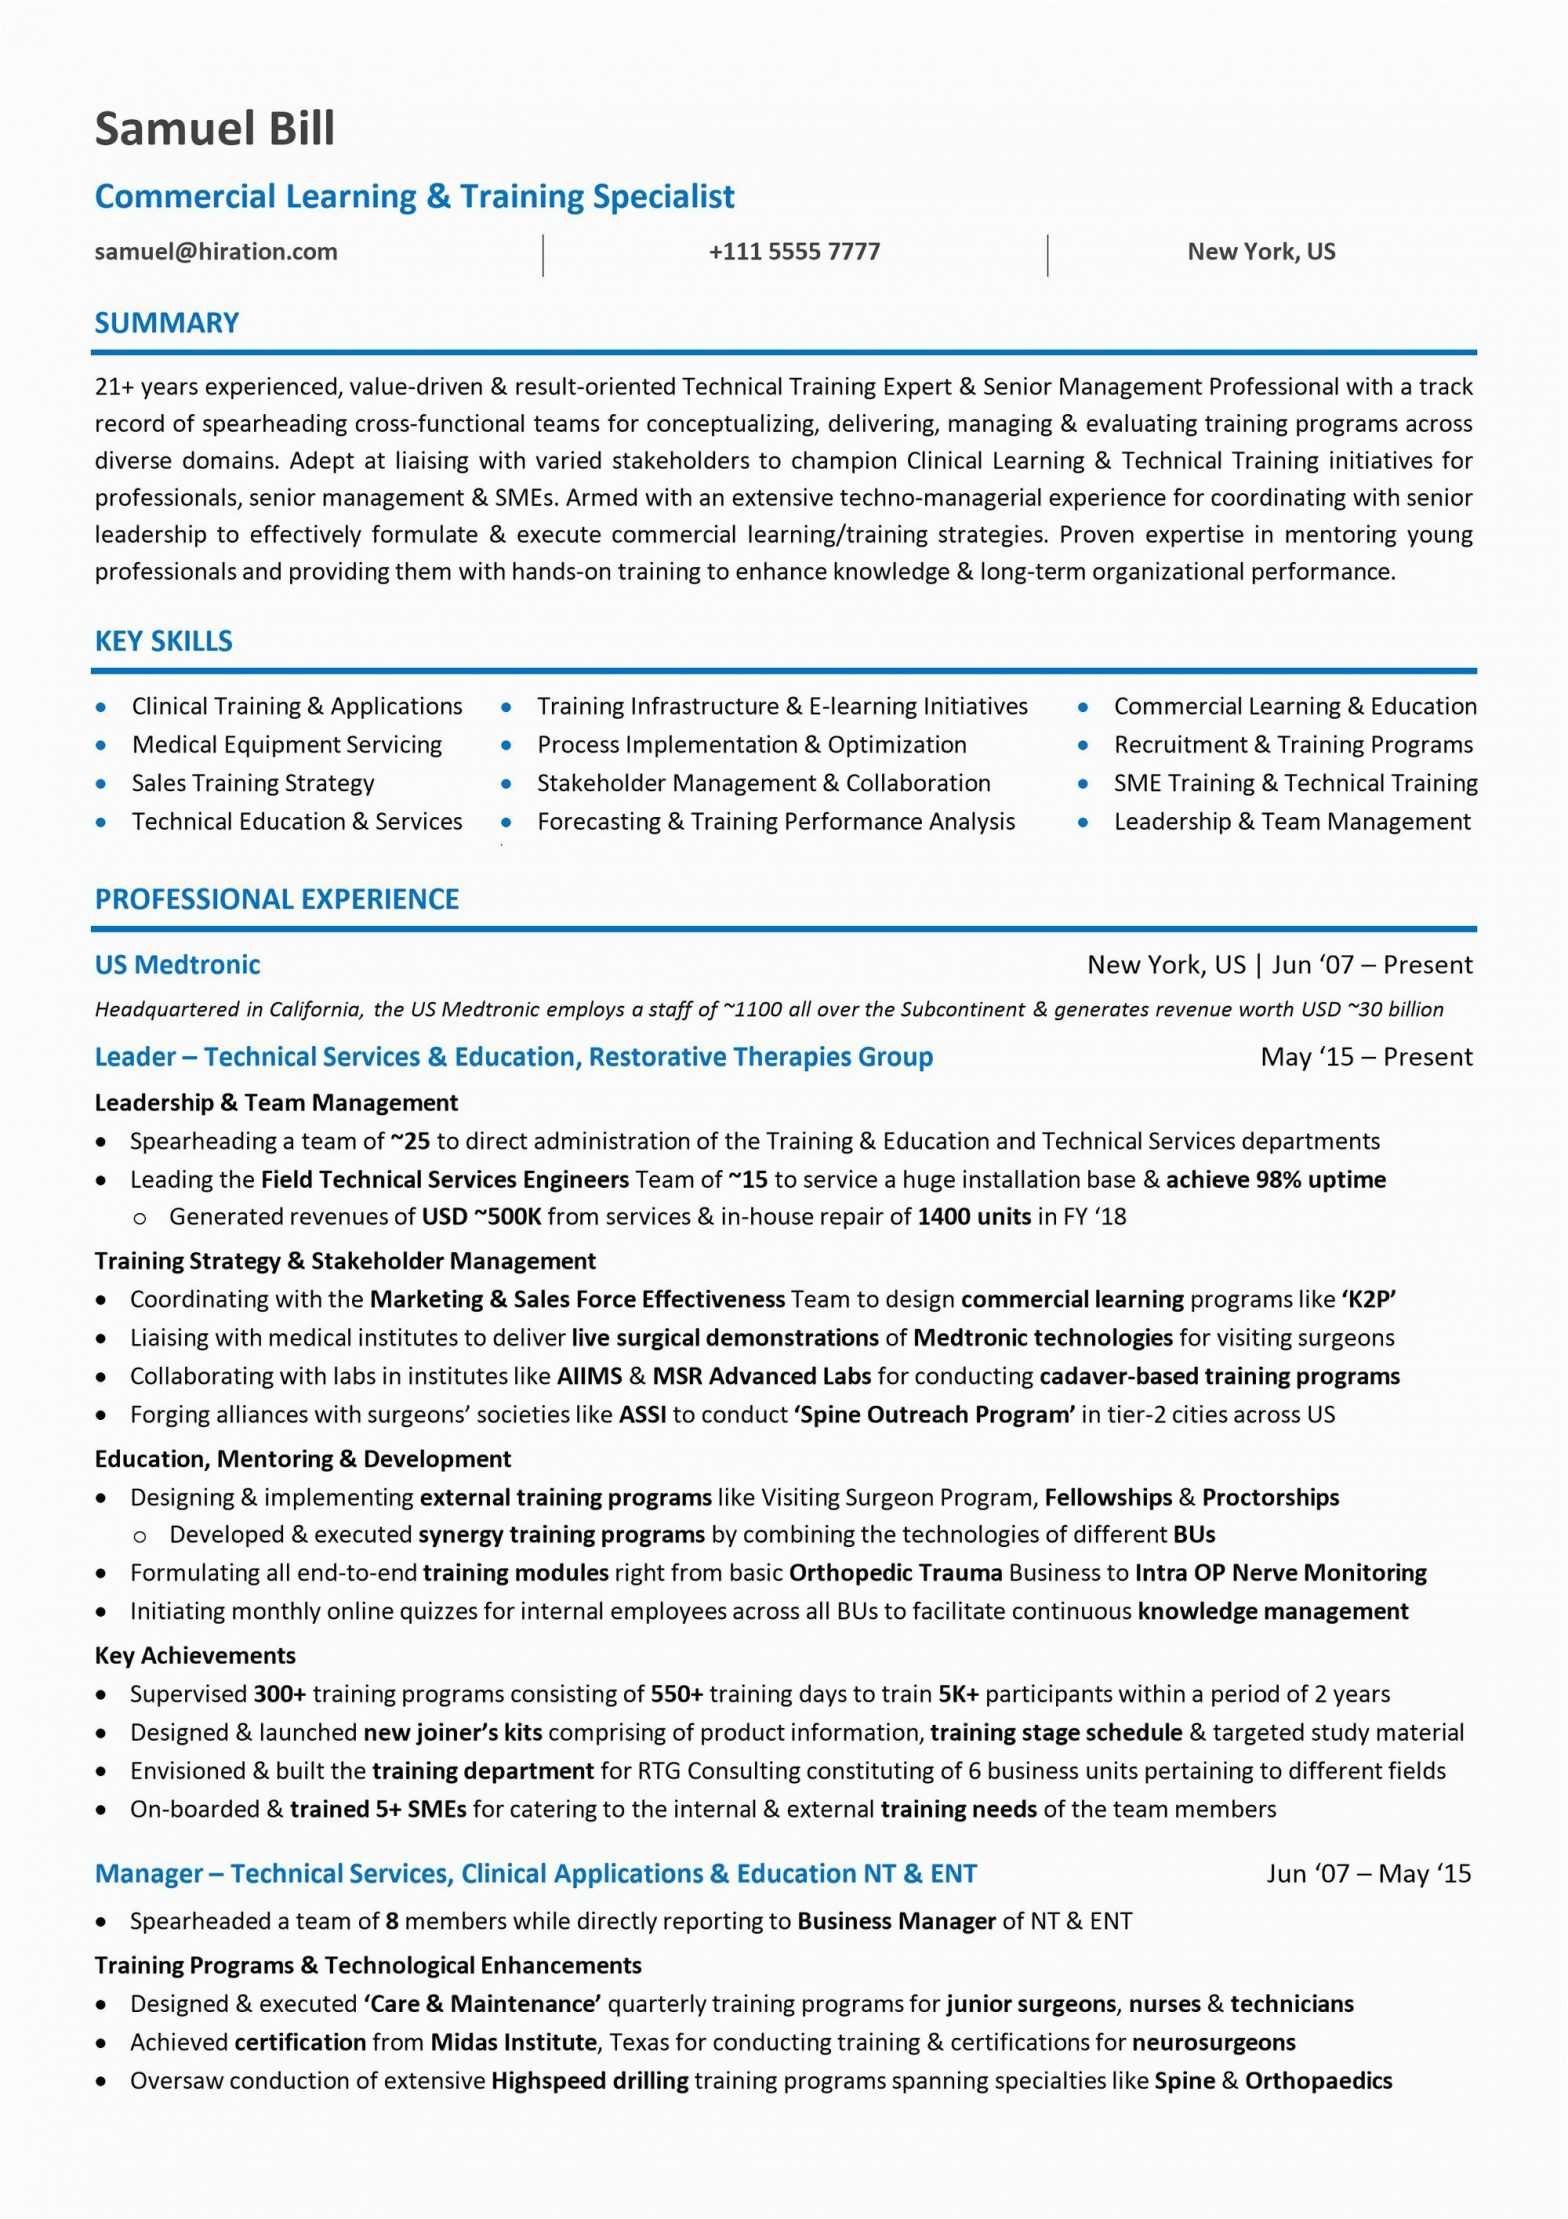 Sample Of Resume Objectives for Career Change General Resume Objective Examples for Career Change Best